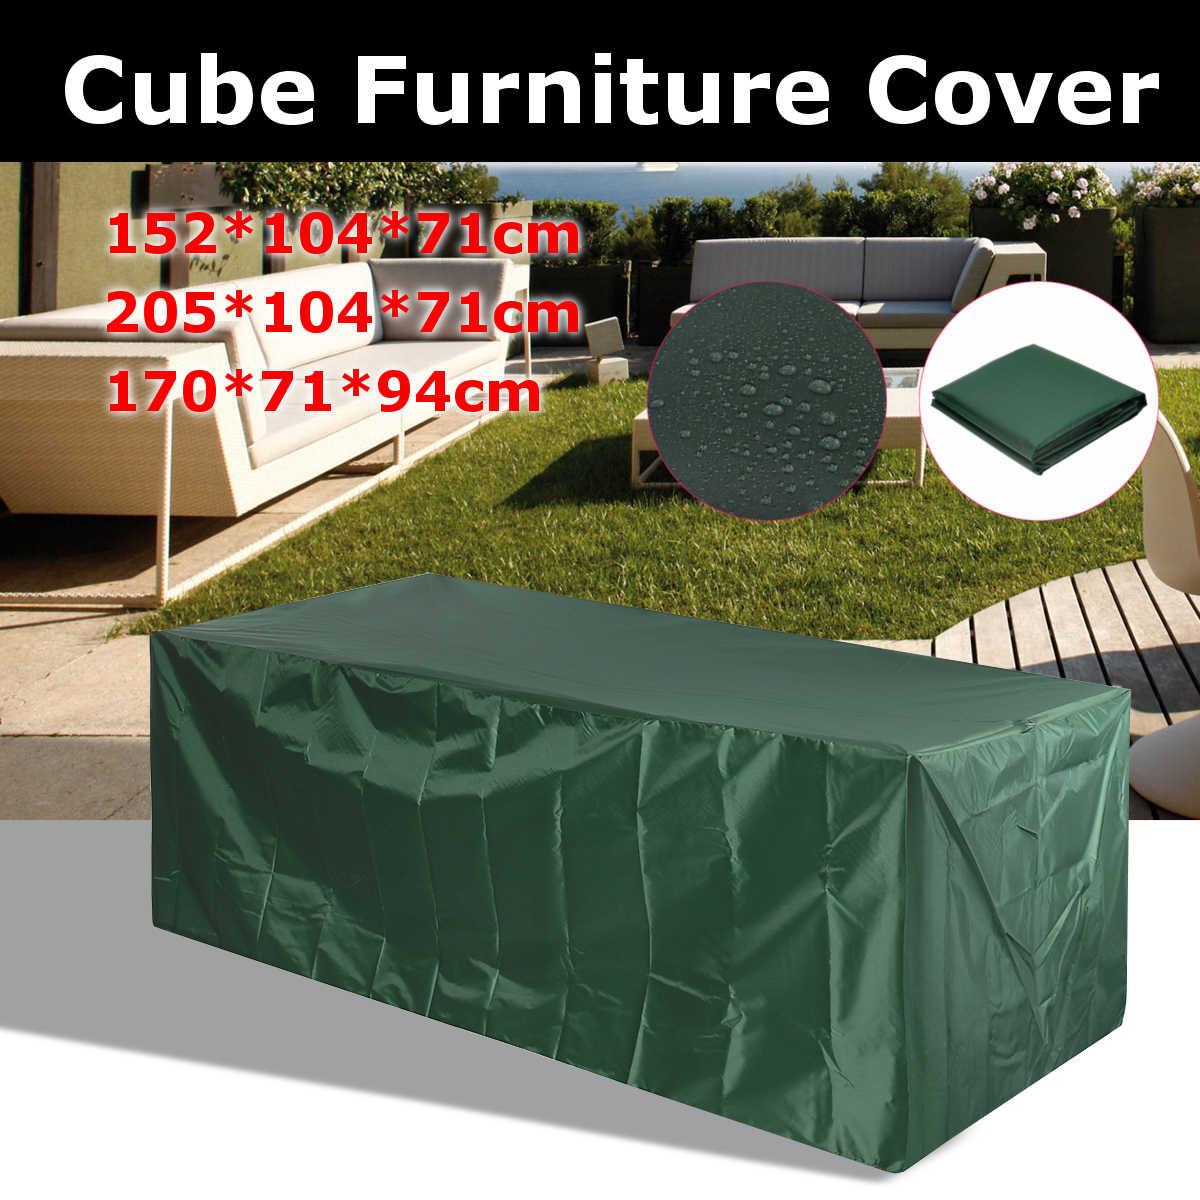 Waterproof Outdoor Garden Furniture Cover Sun Rain Protector Sofa Protection Set Patio Snow Dustproof Covers